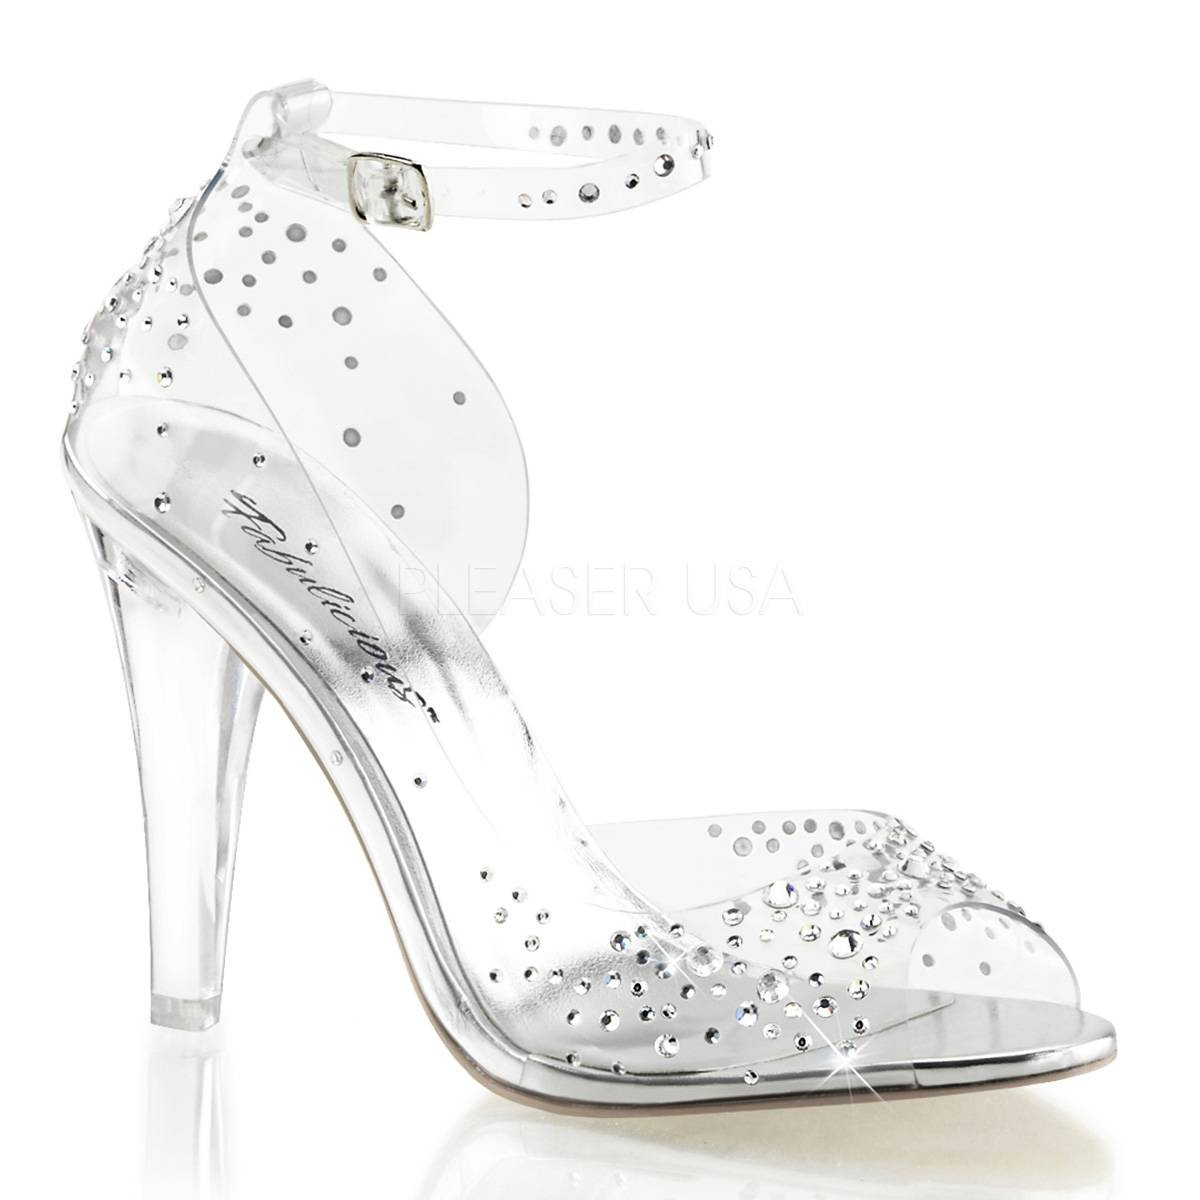 Sandalen - CLEARLY 430RS ° Damen Sandalette ° Transparent Matt ° Fabulicious  - Onlineshop RedSixty